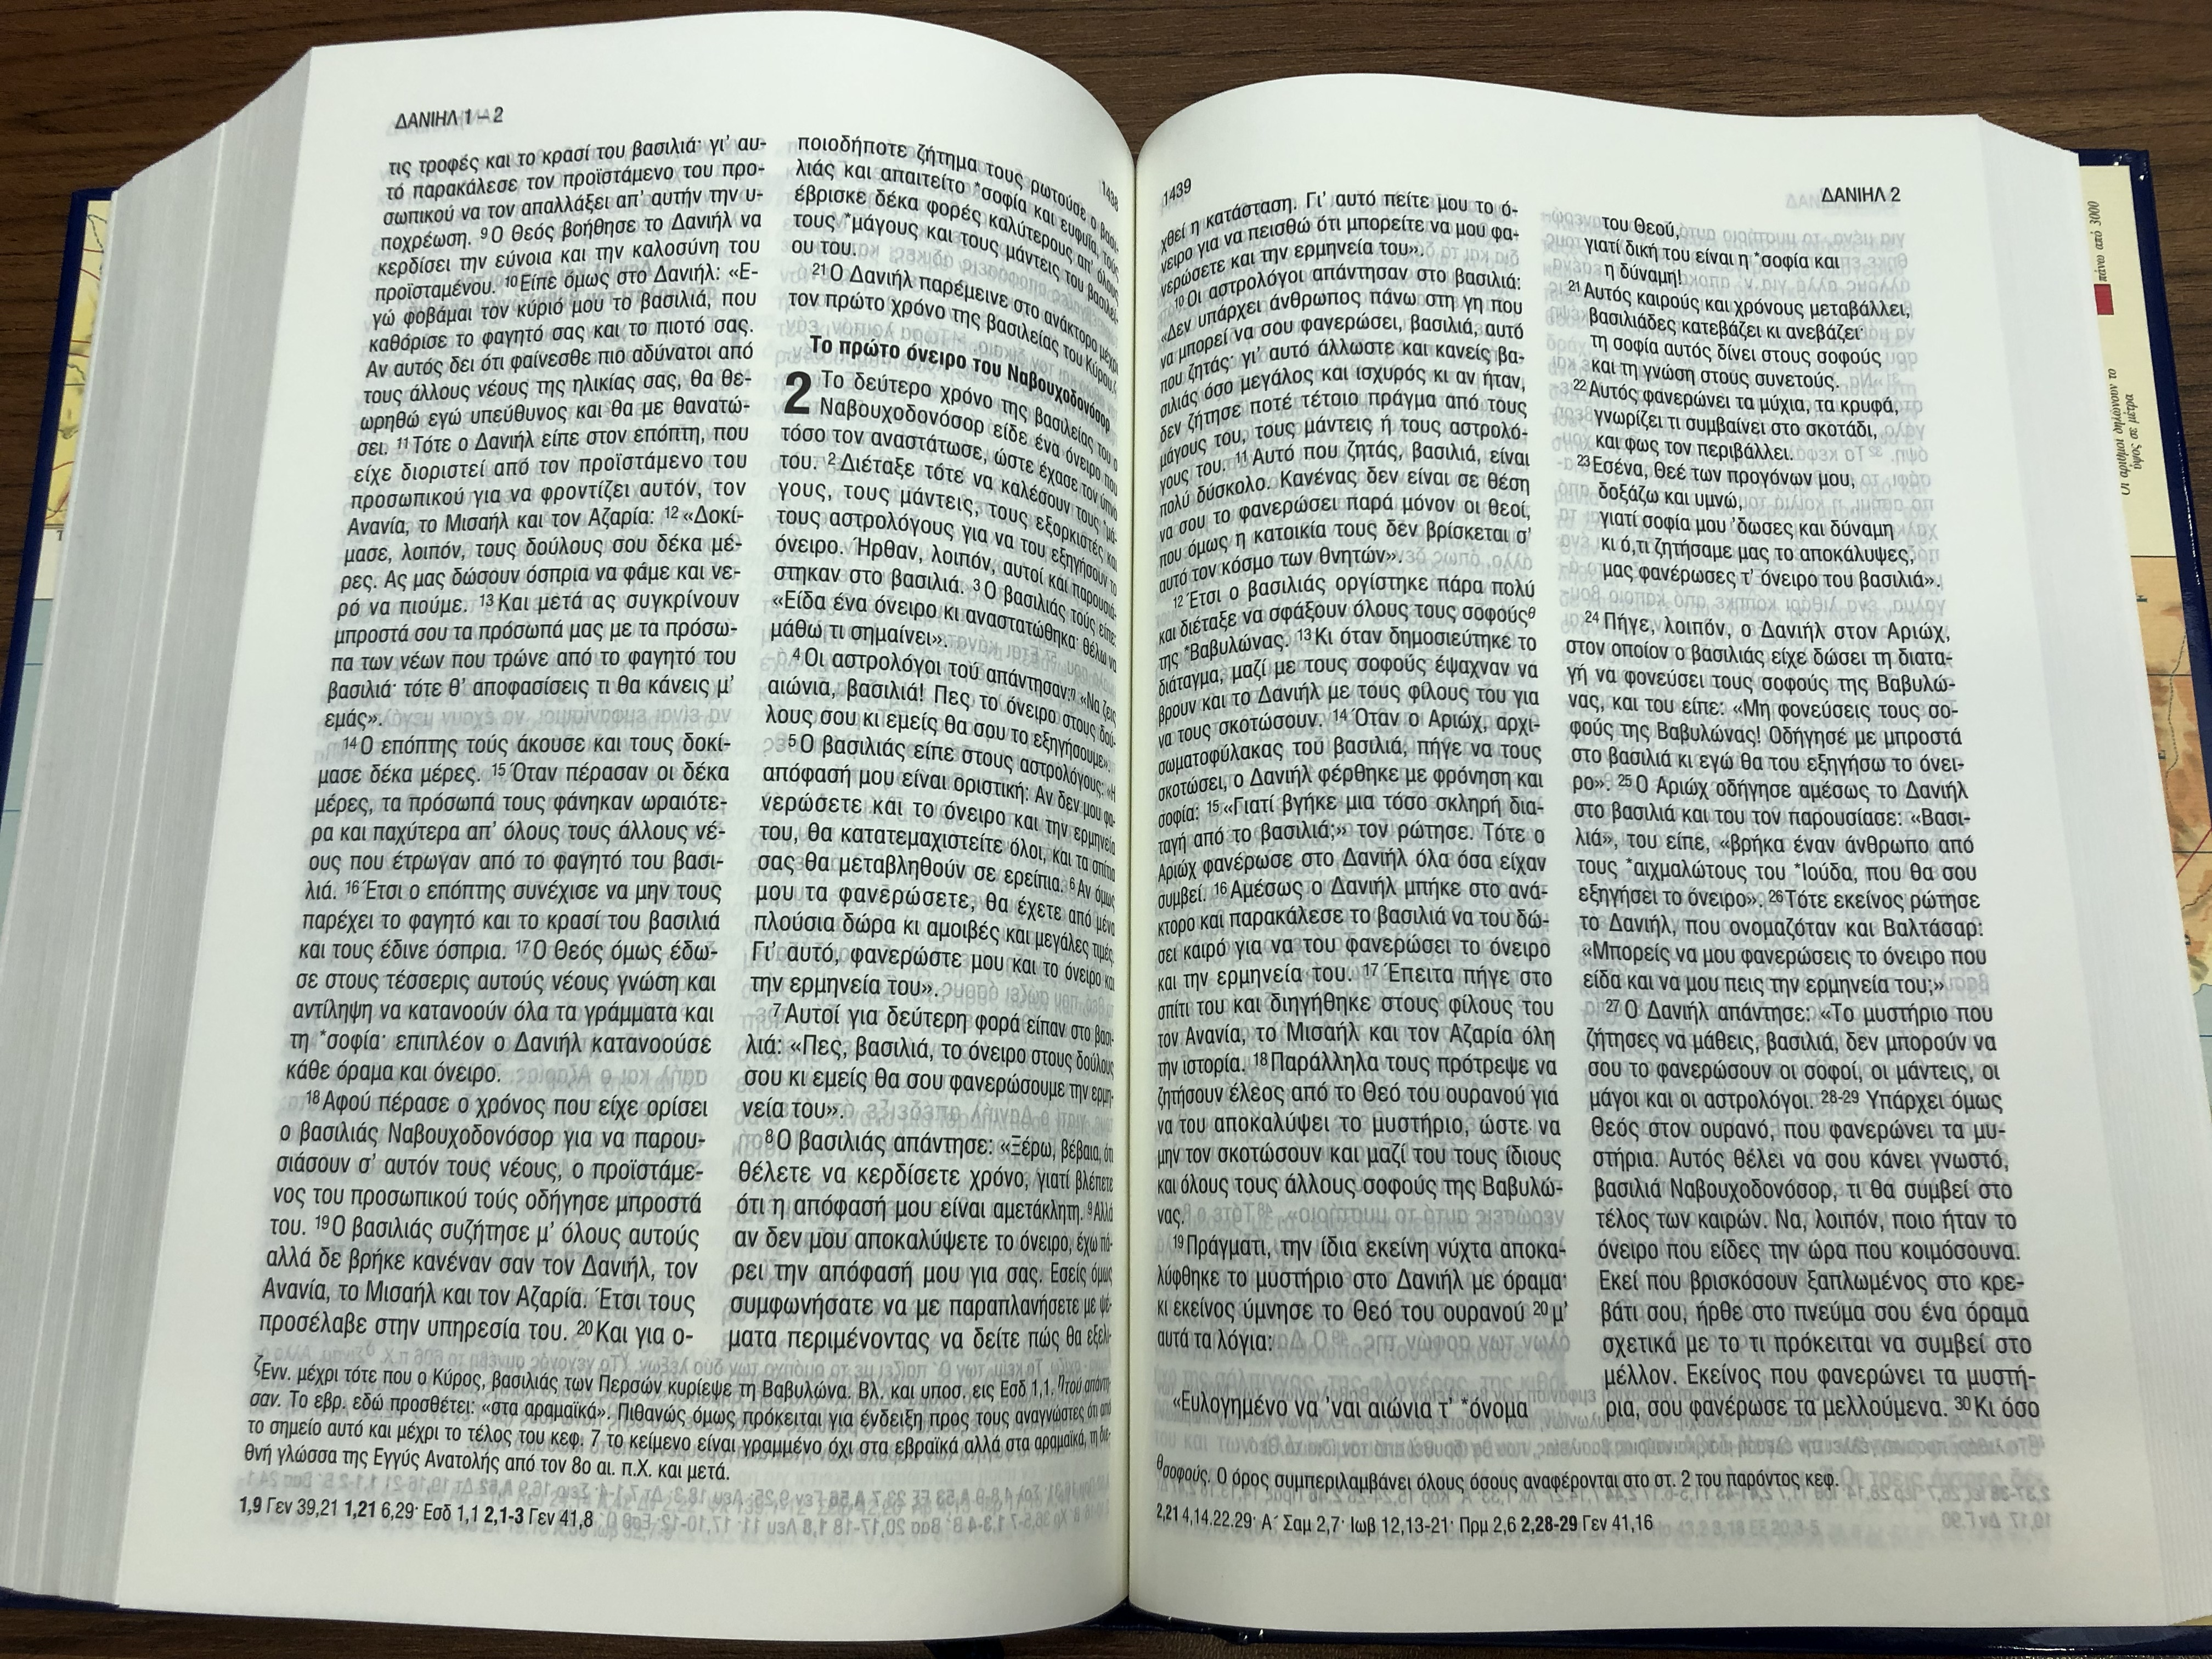 -the-holy-bible-in-today-s-greek-w-deuterocanonicals-13-.jpg